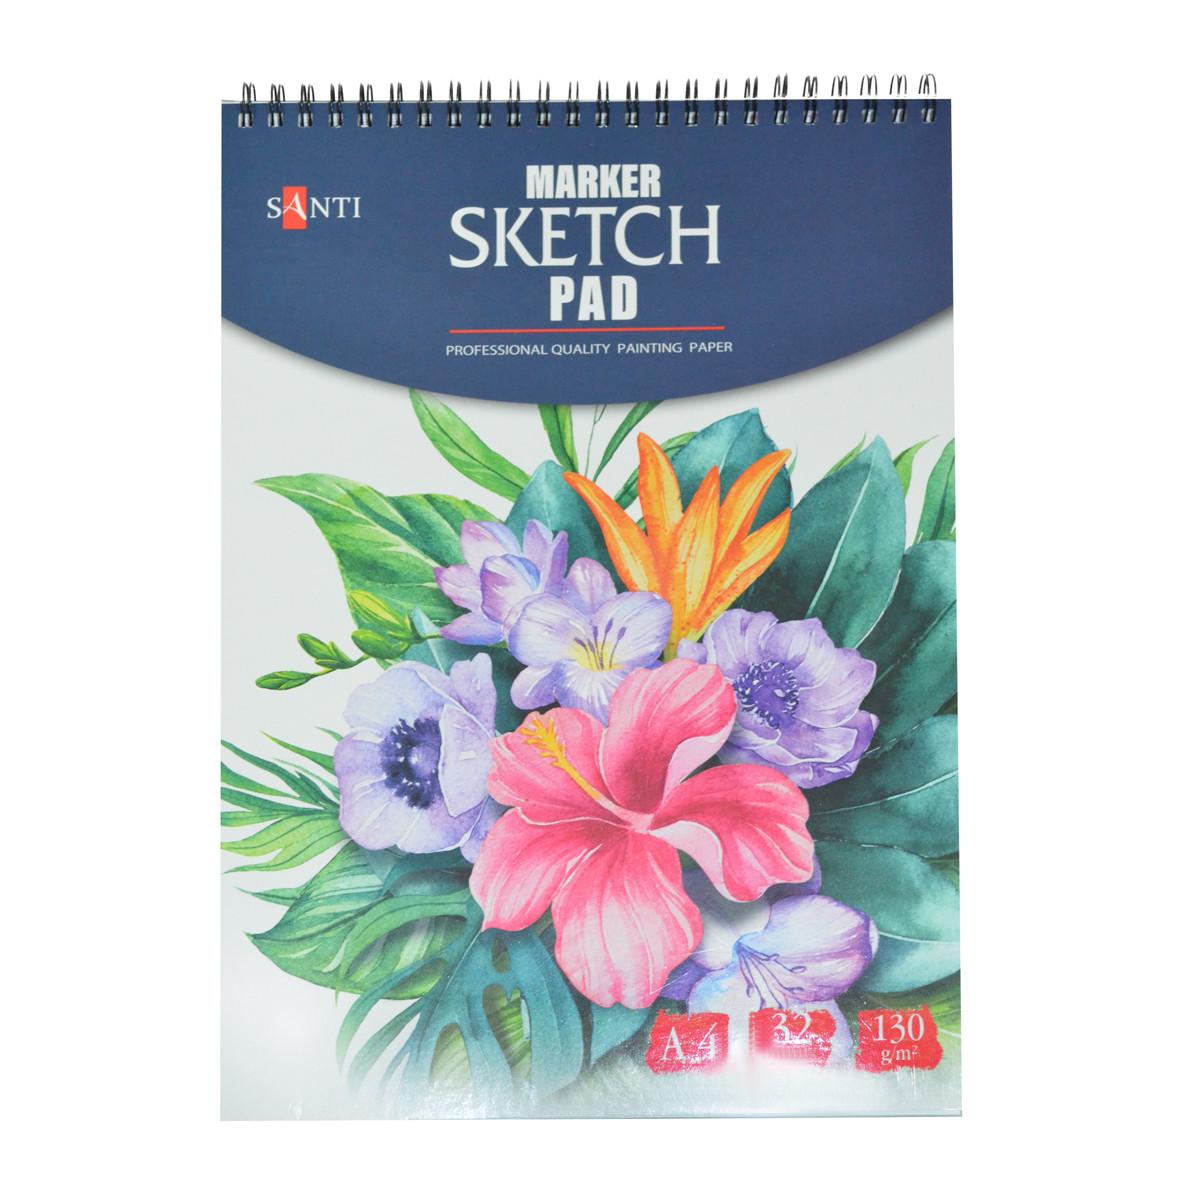 Альбом для малювання маркерами А4 130г/м2 32арк. 742612